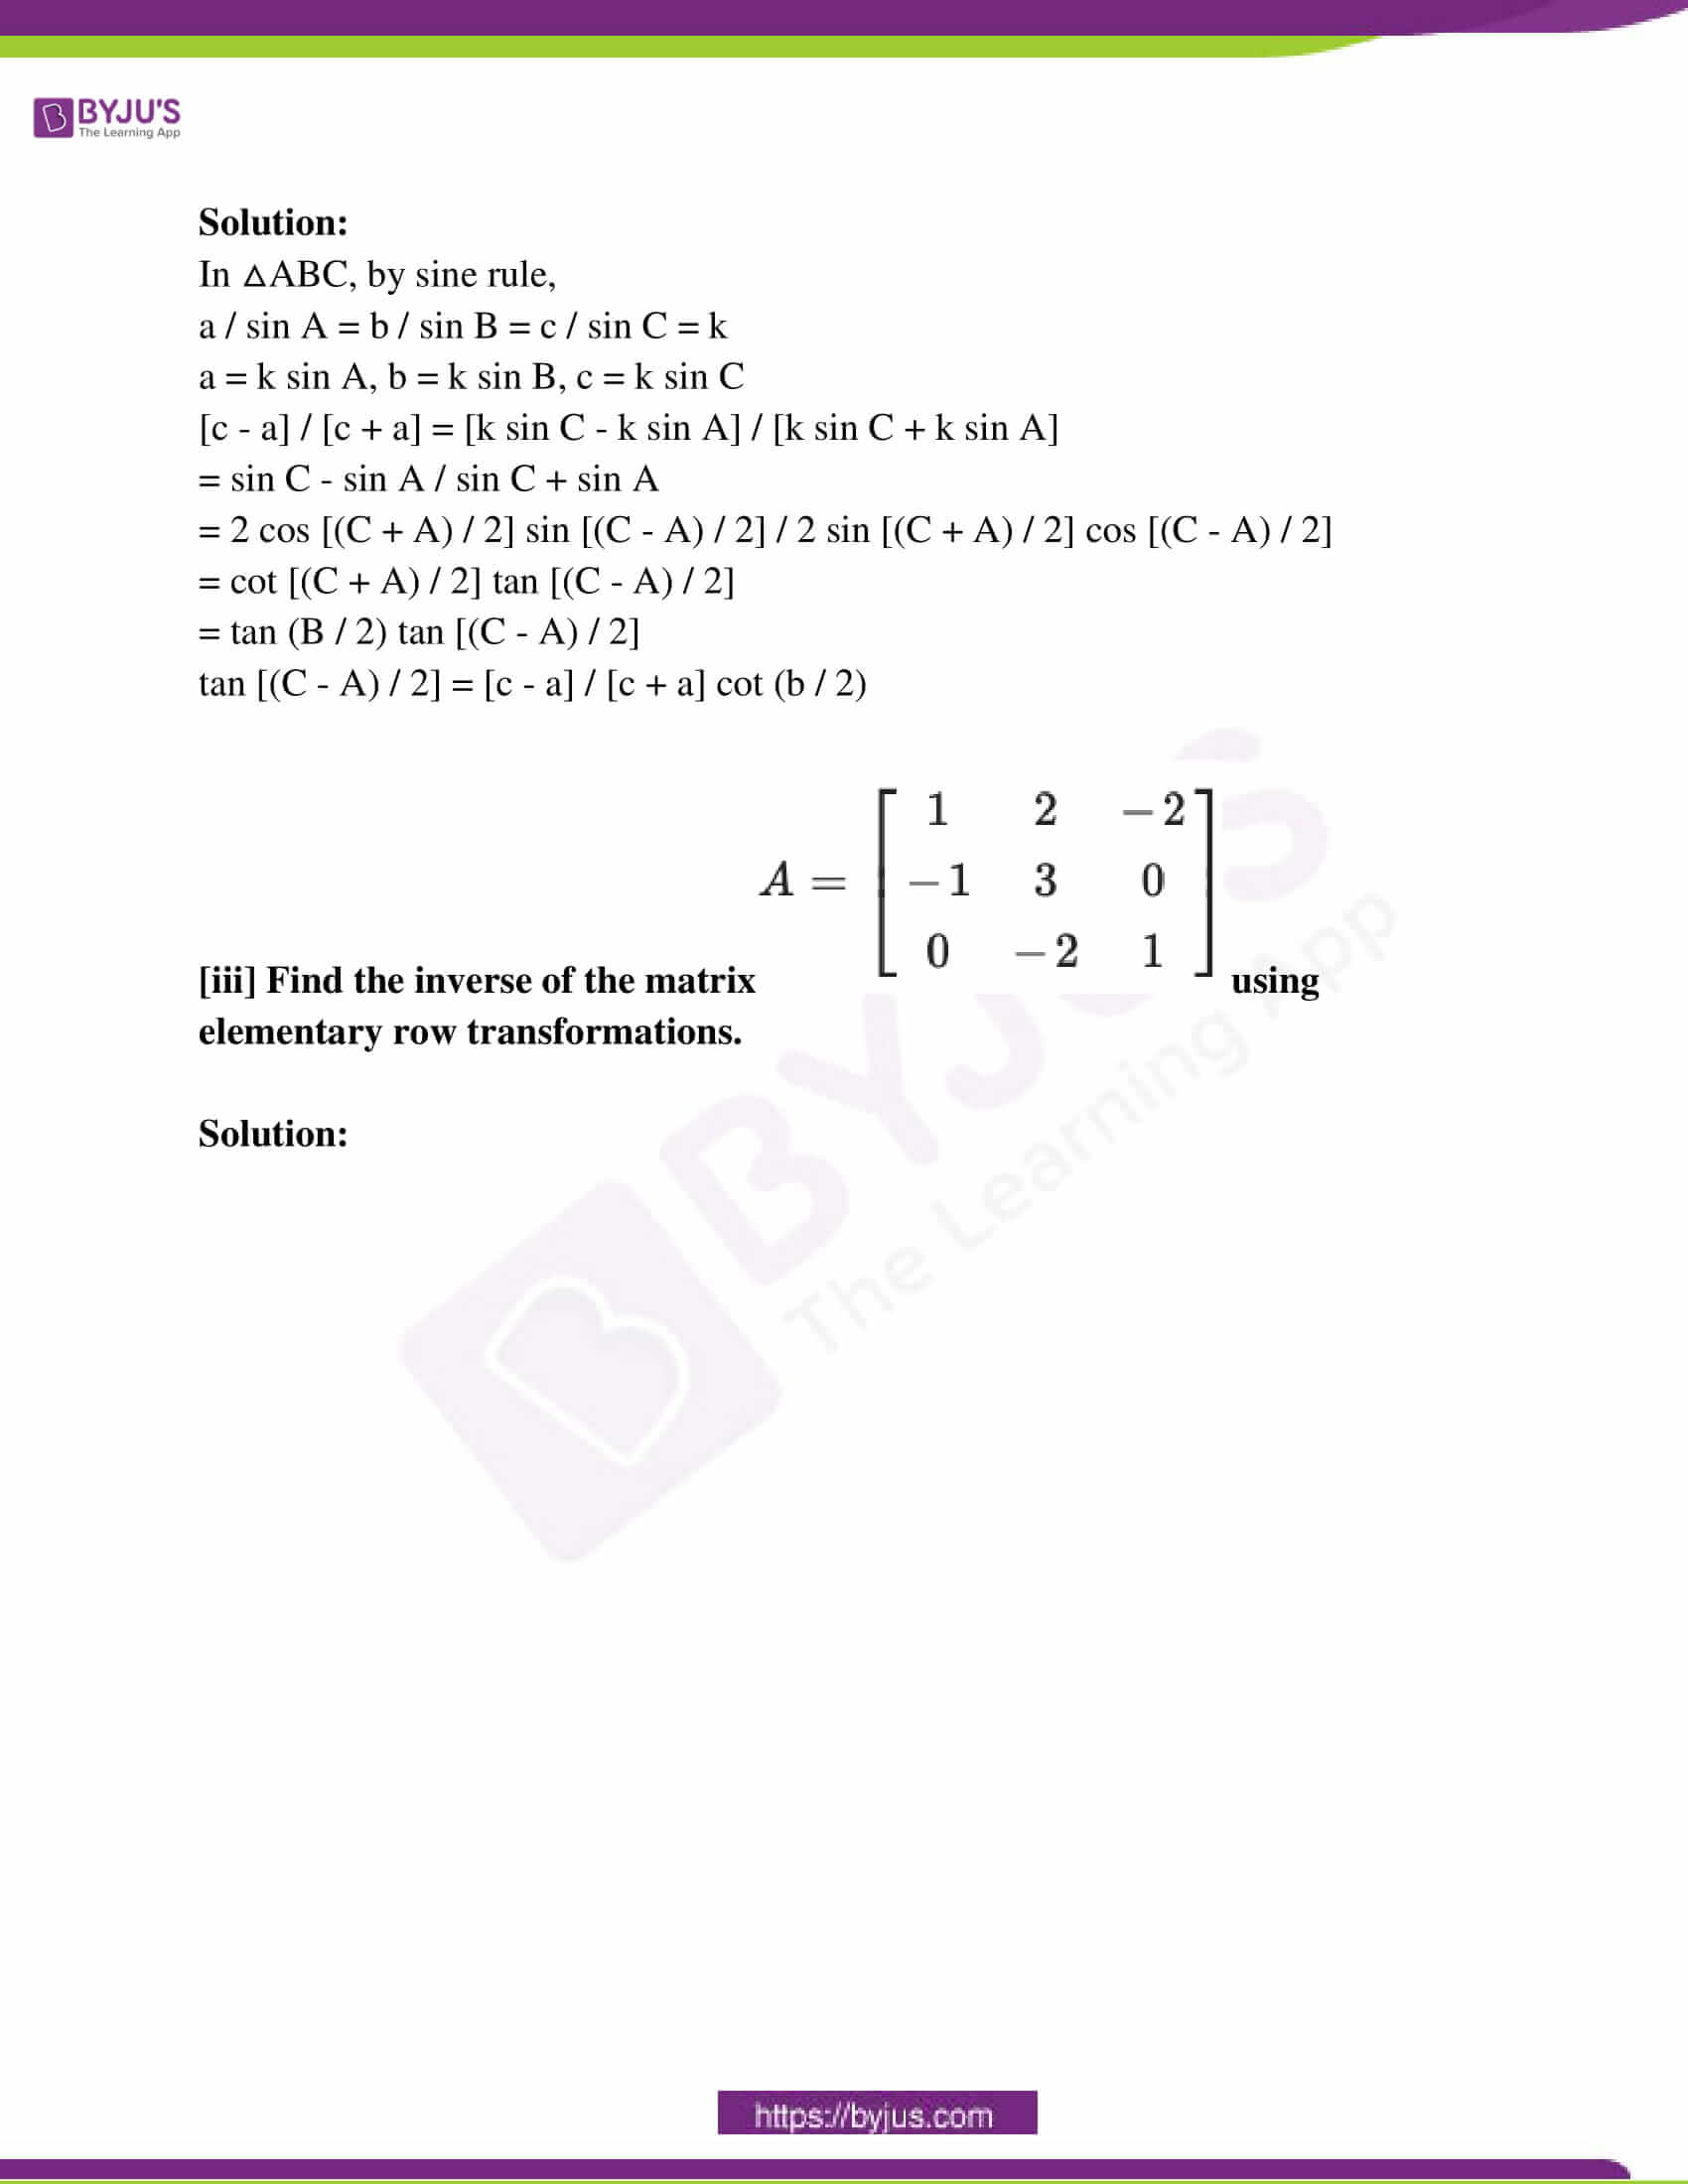 maharashtra class 12 exam question paper solutions march 2018 08